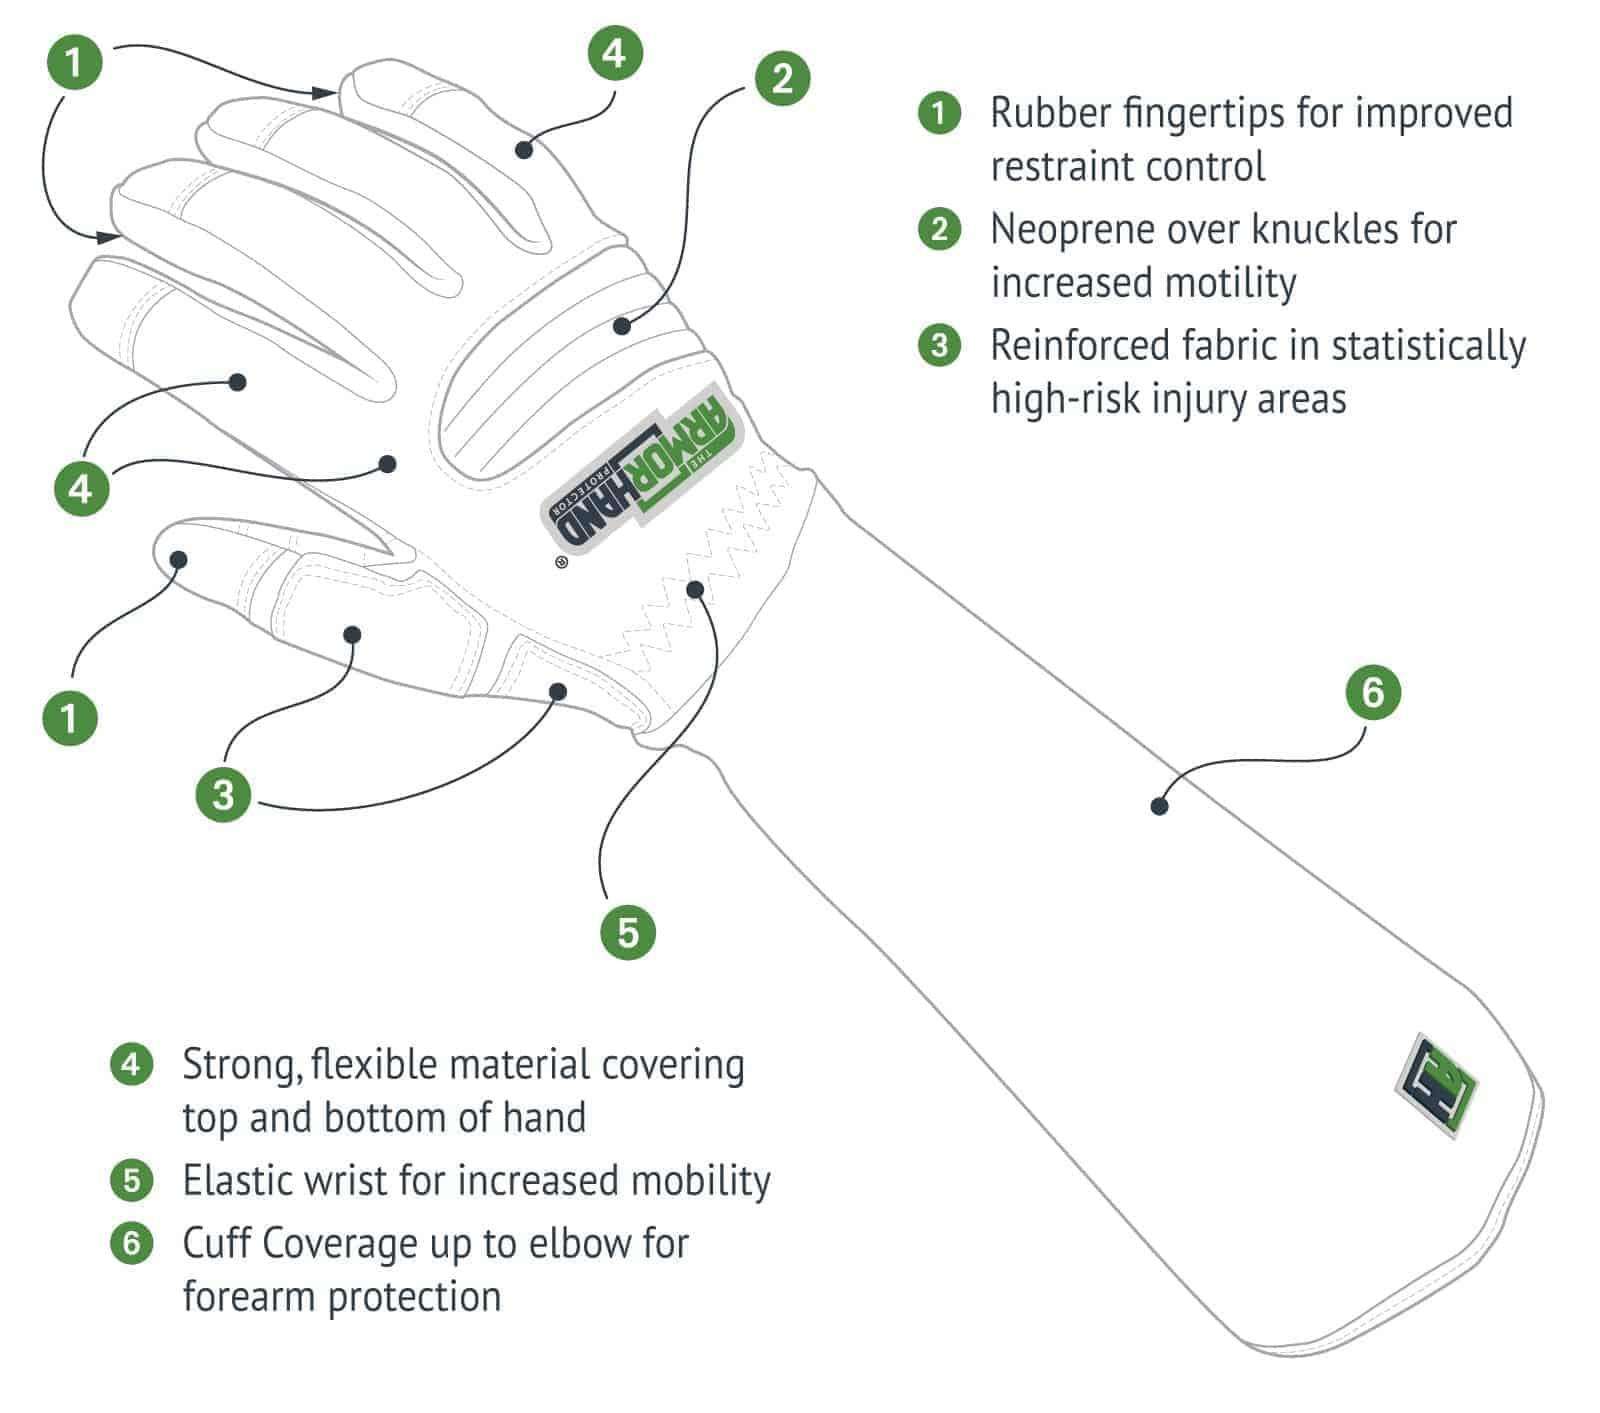 ArmOR Hand Glove Illustration